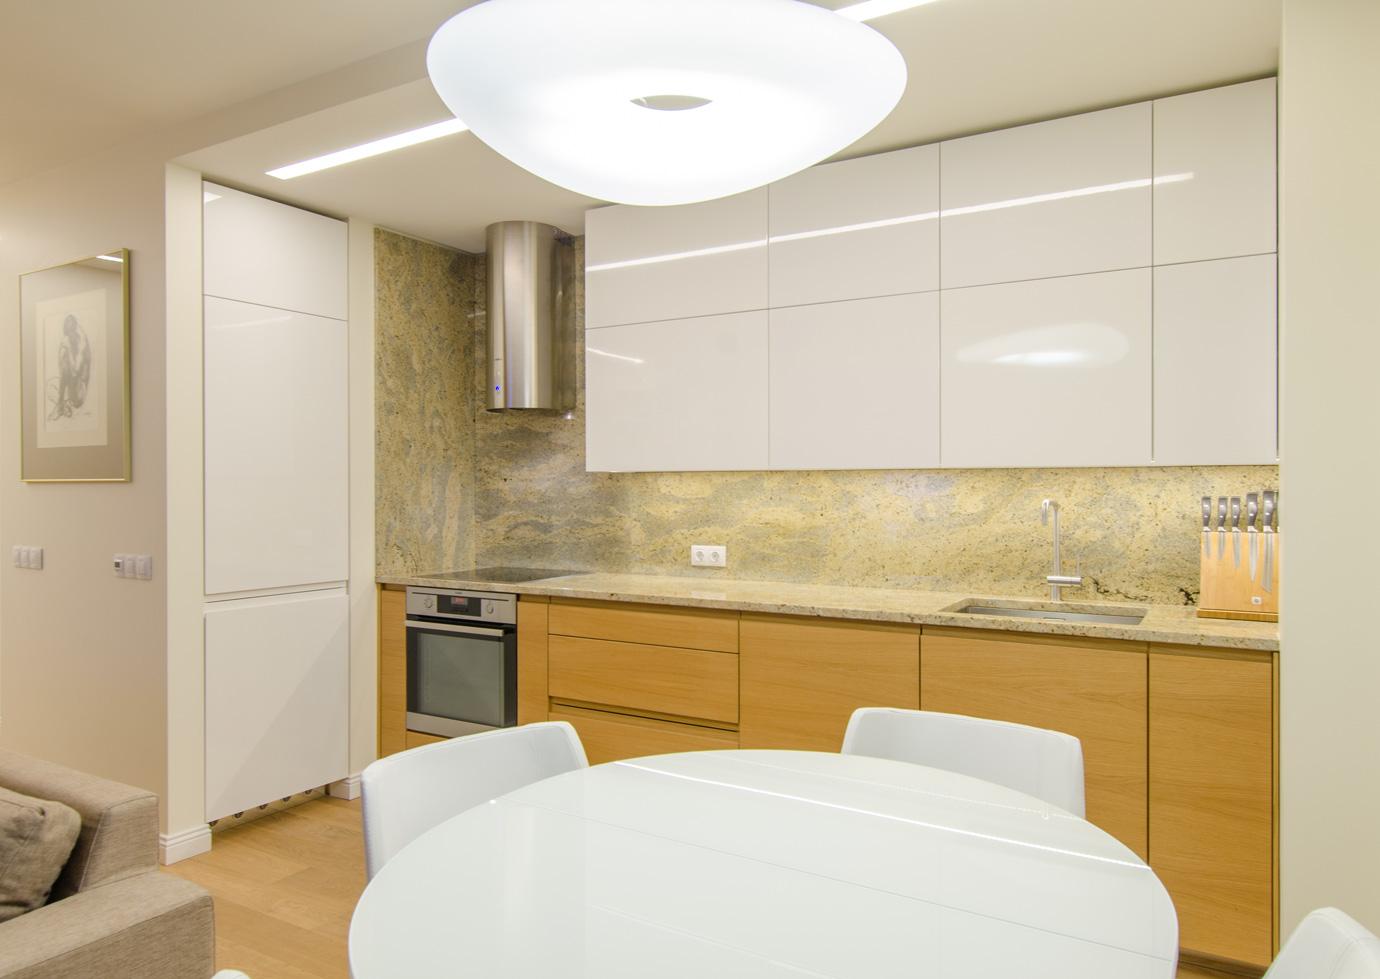 moderni_virtuve_dizainas